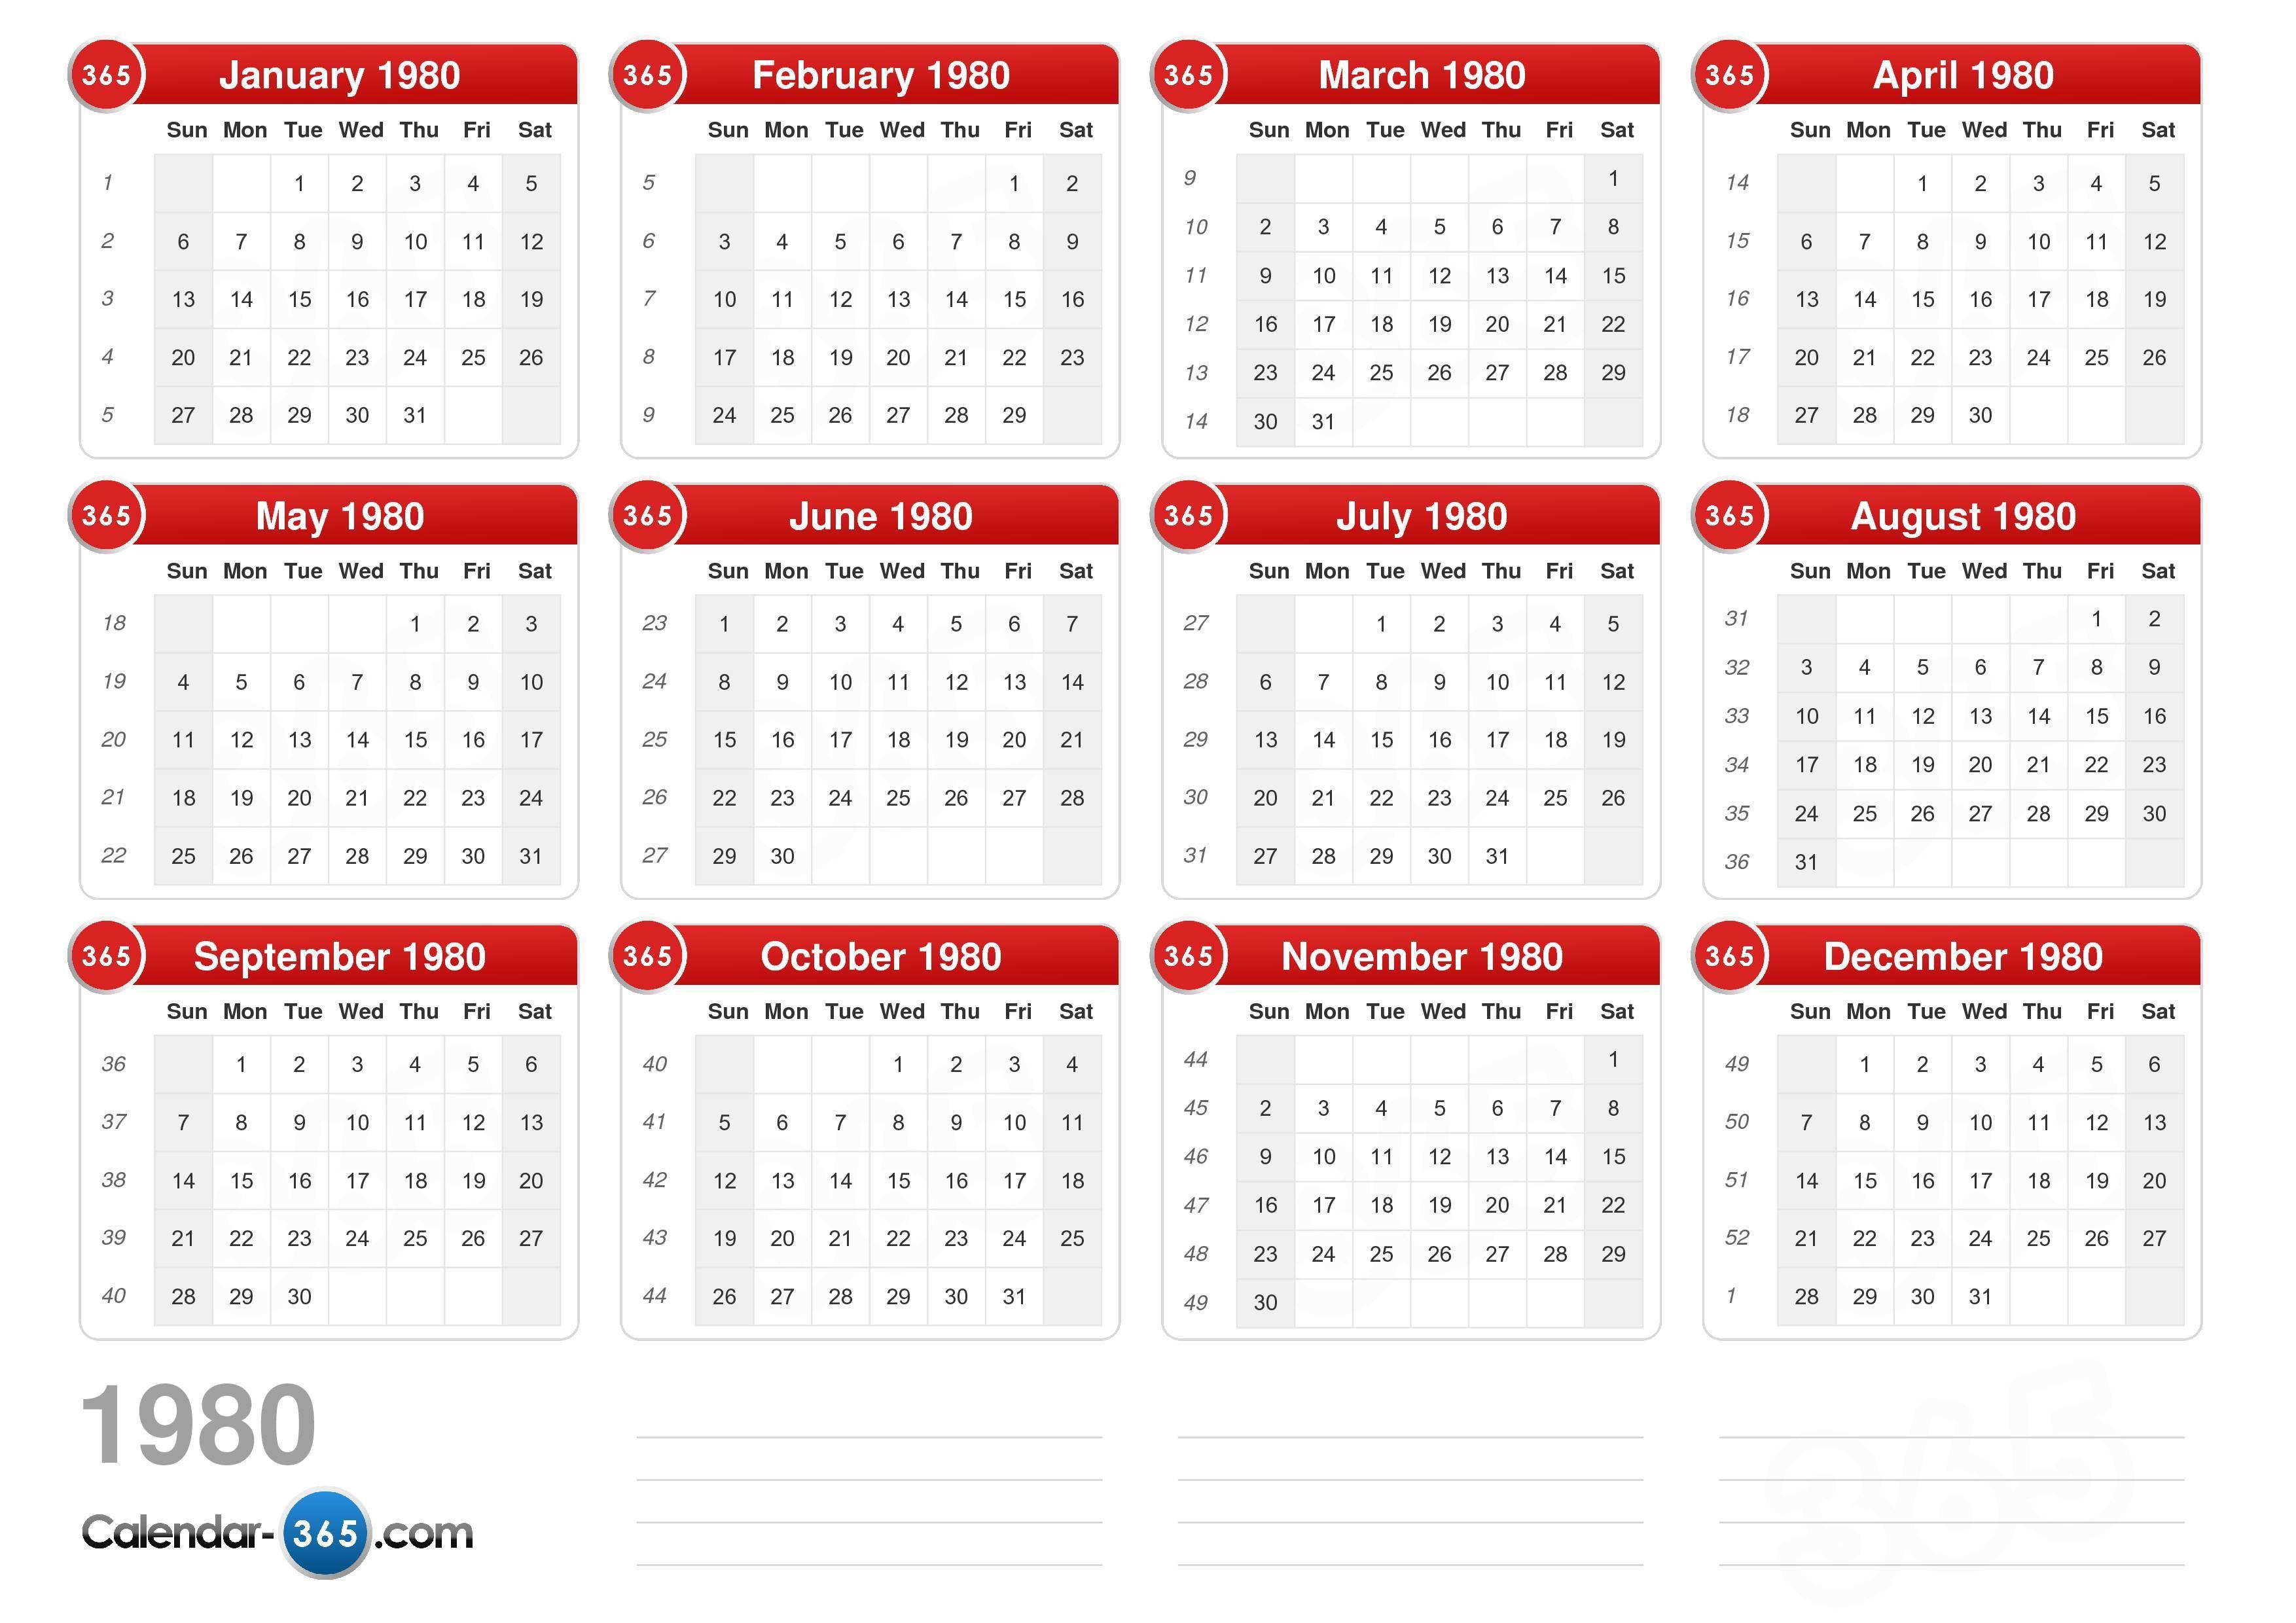 1980 Calendar